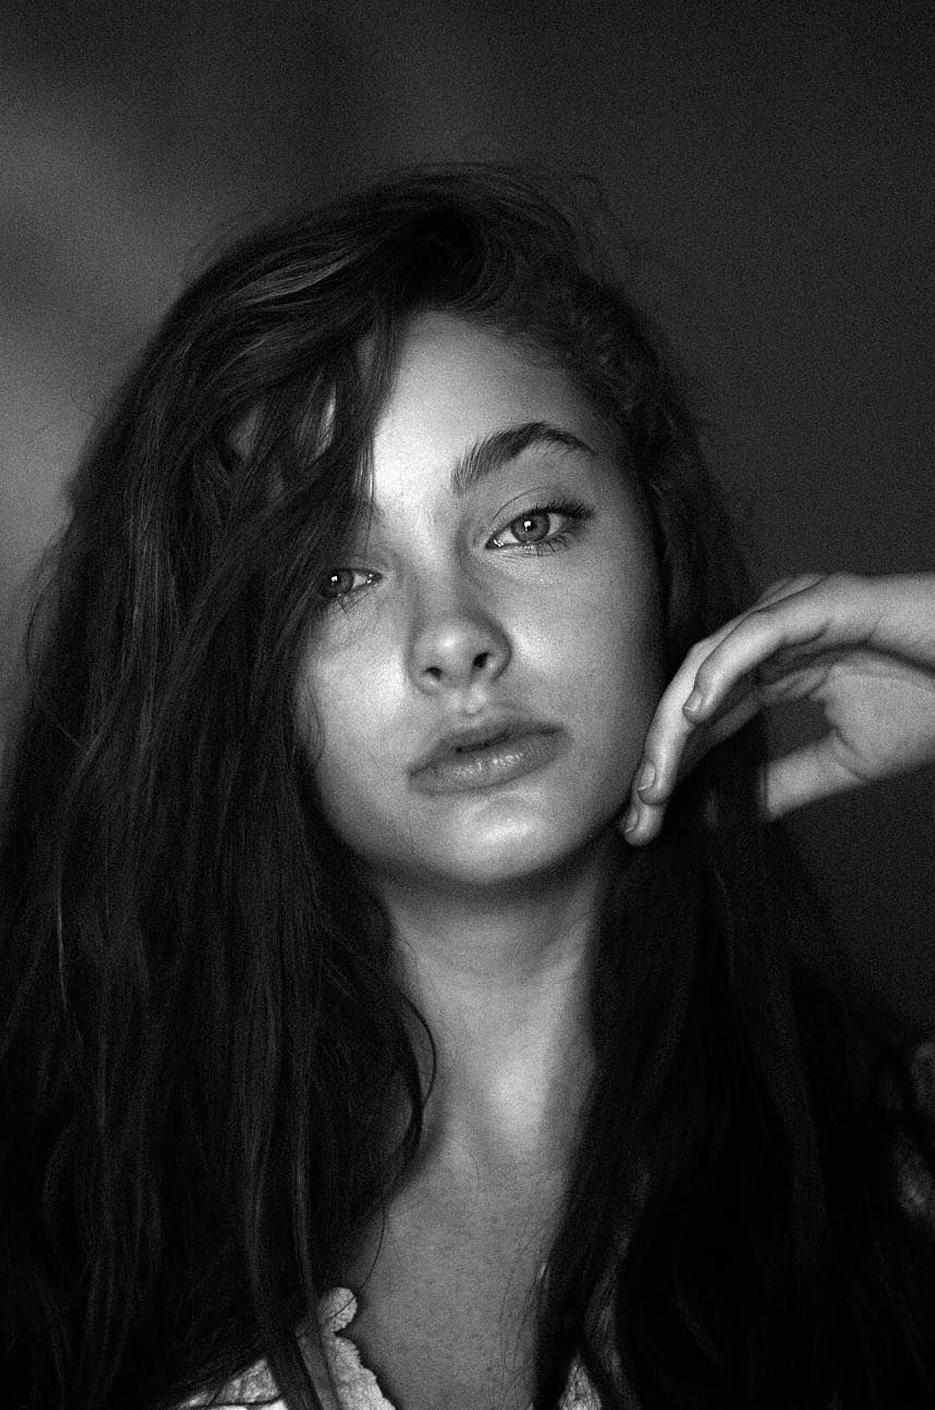 Portrait-069.jpg